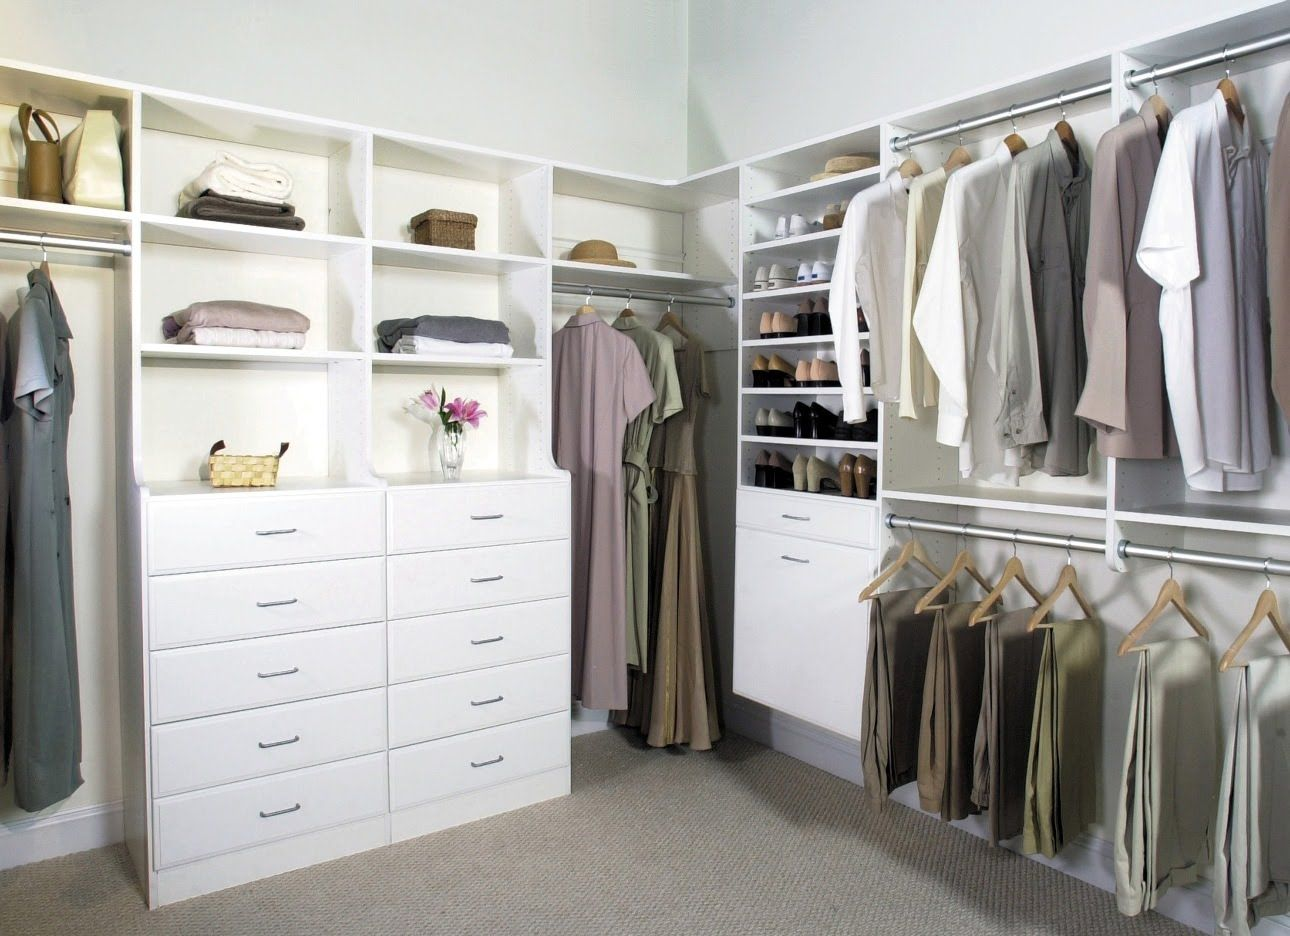 accesorios interiores armarios - Interiores De Armarios